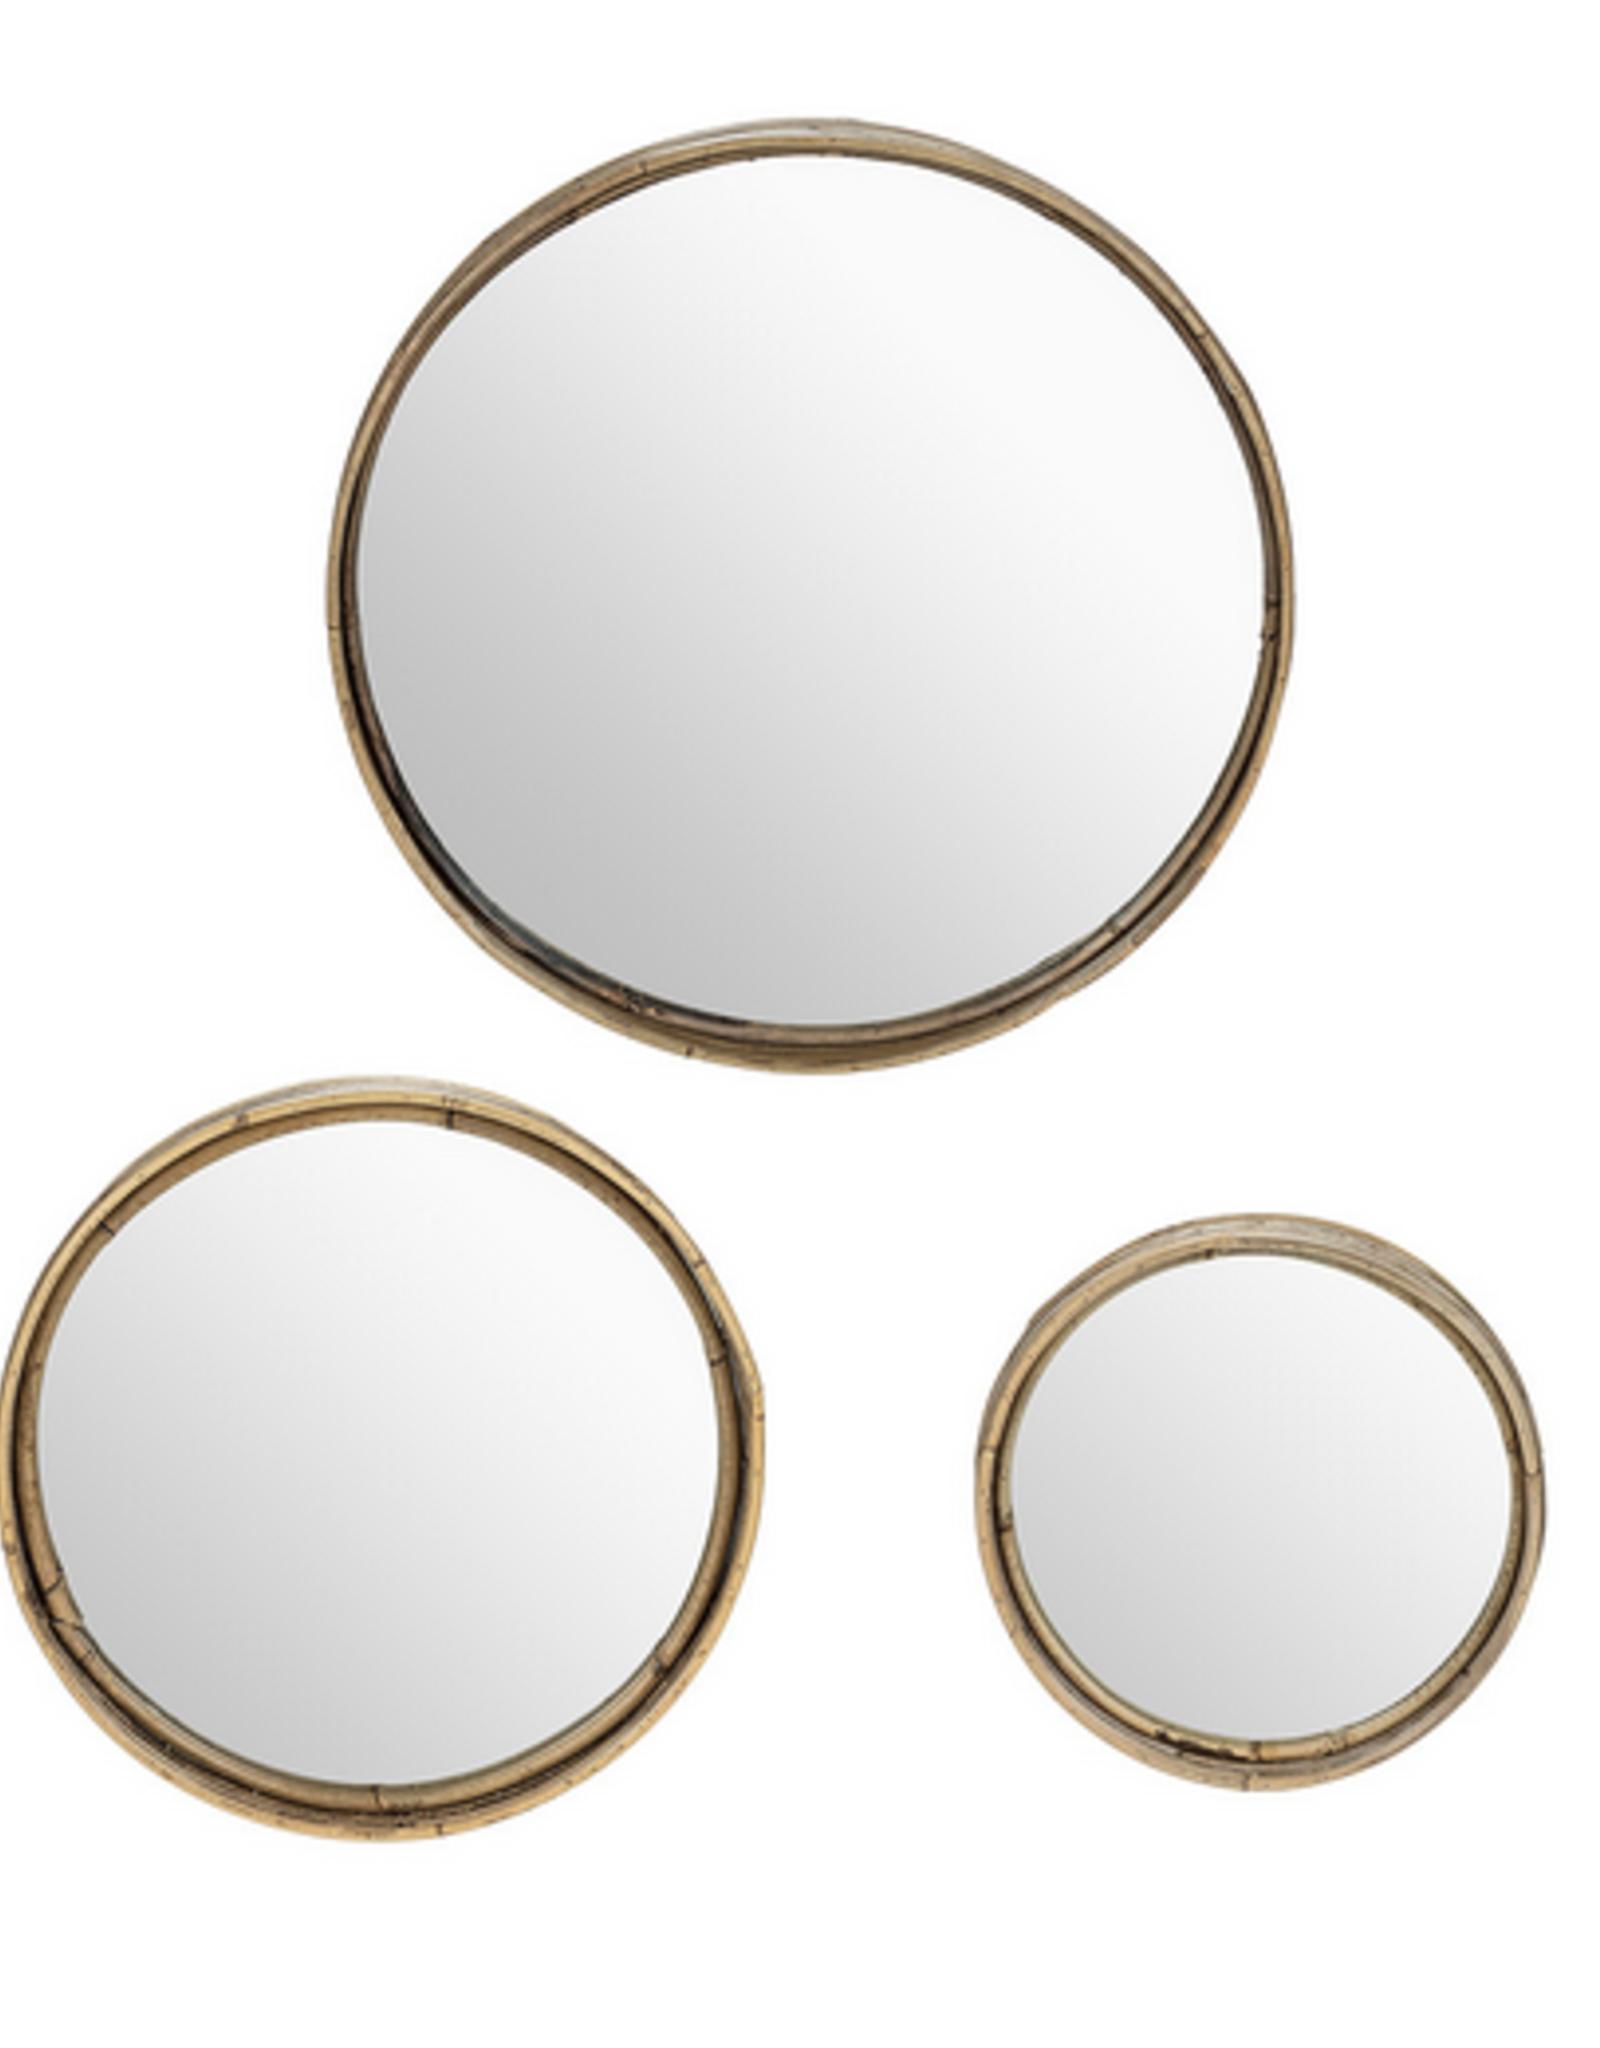 "Medium Round Wall Mirror with Rattan 16"""